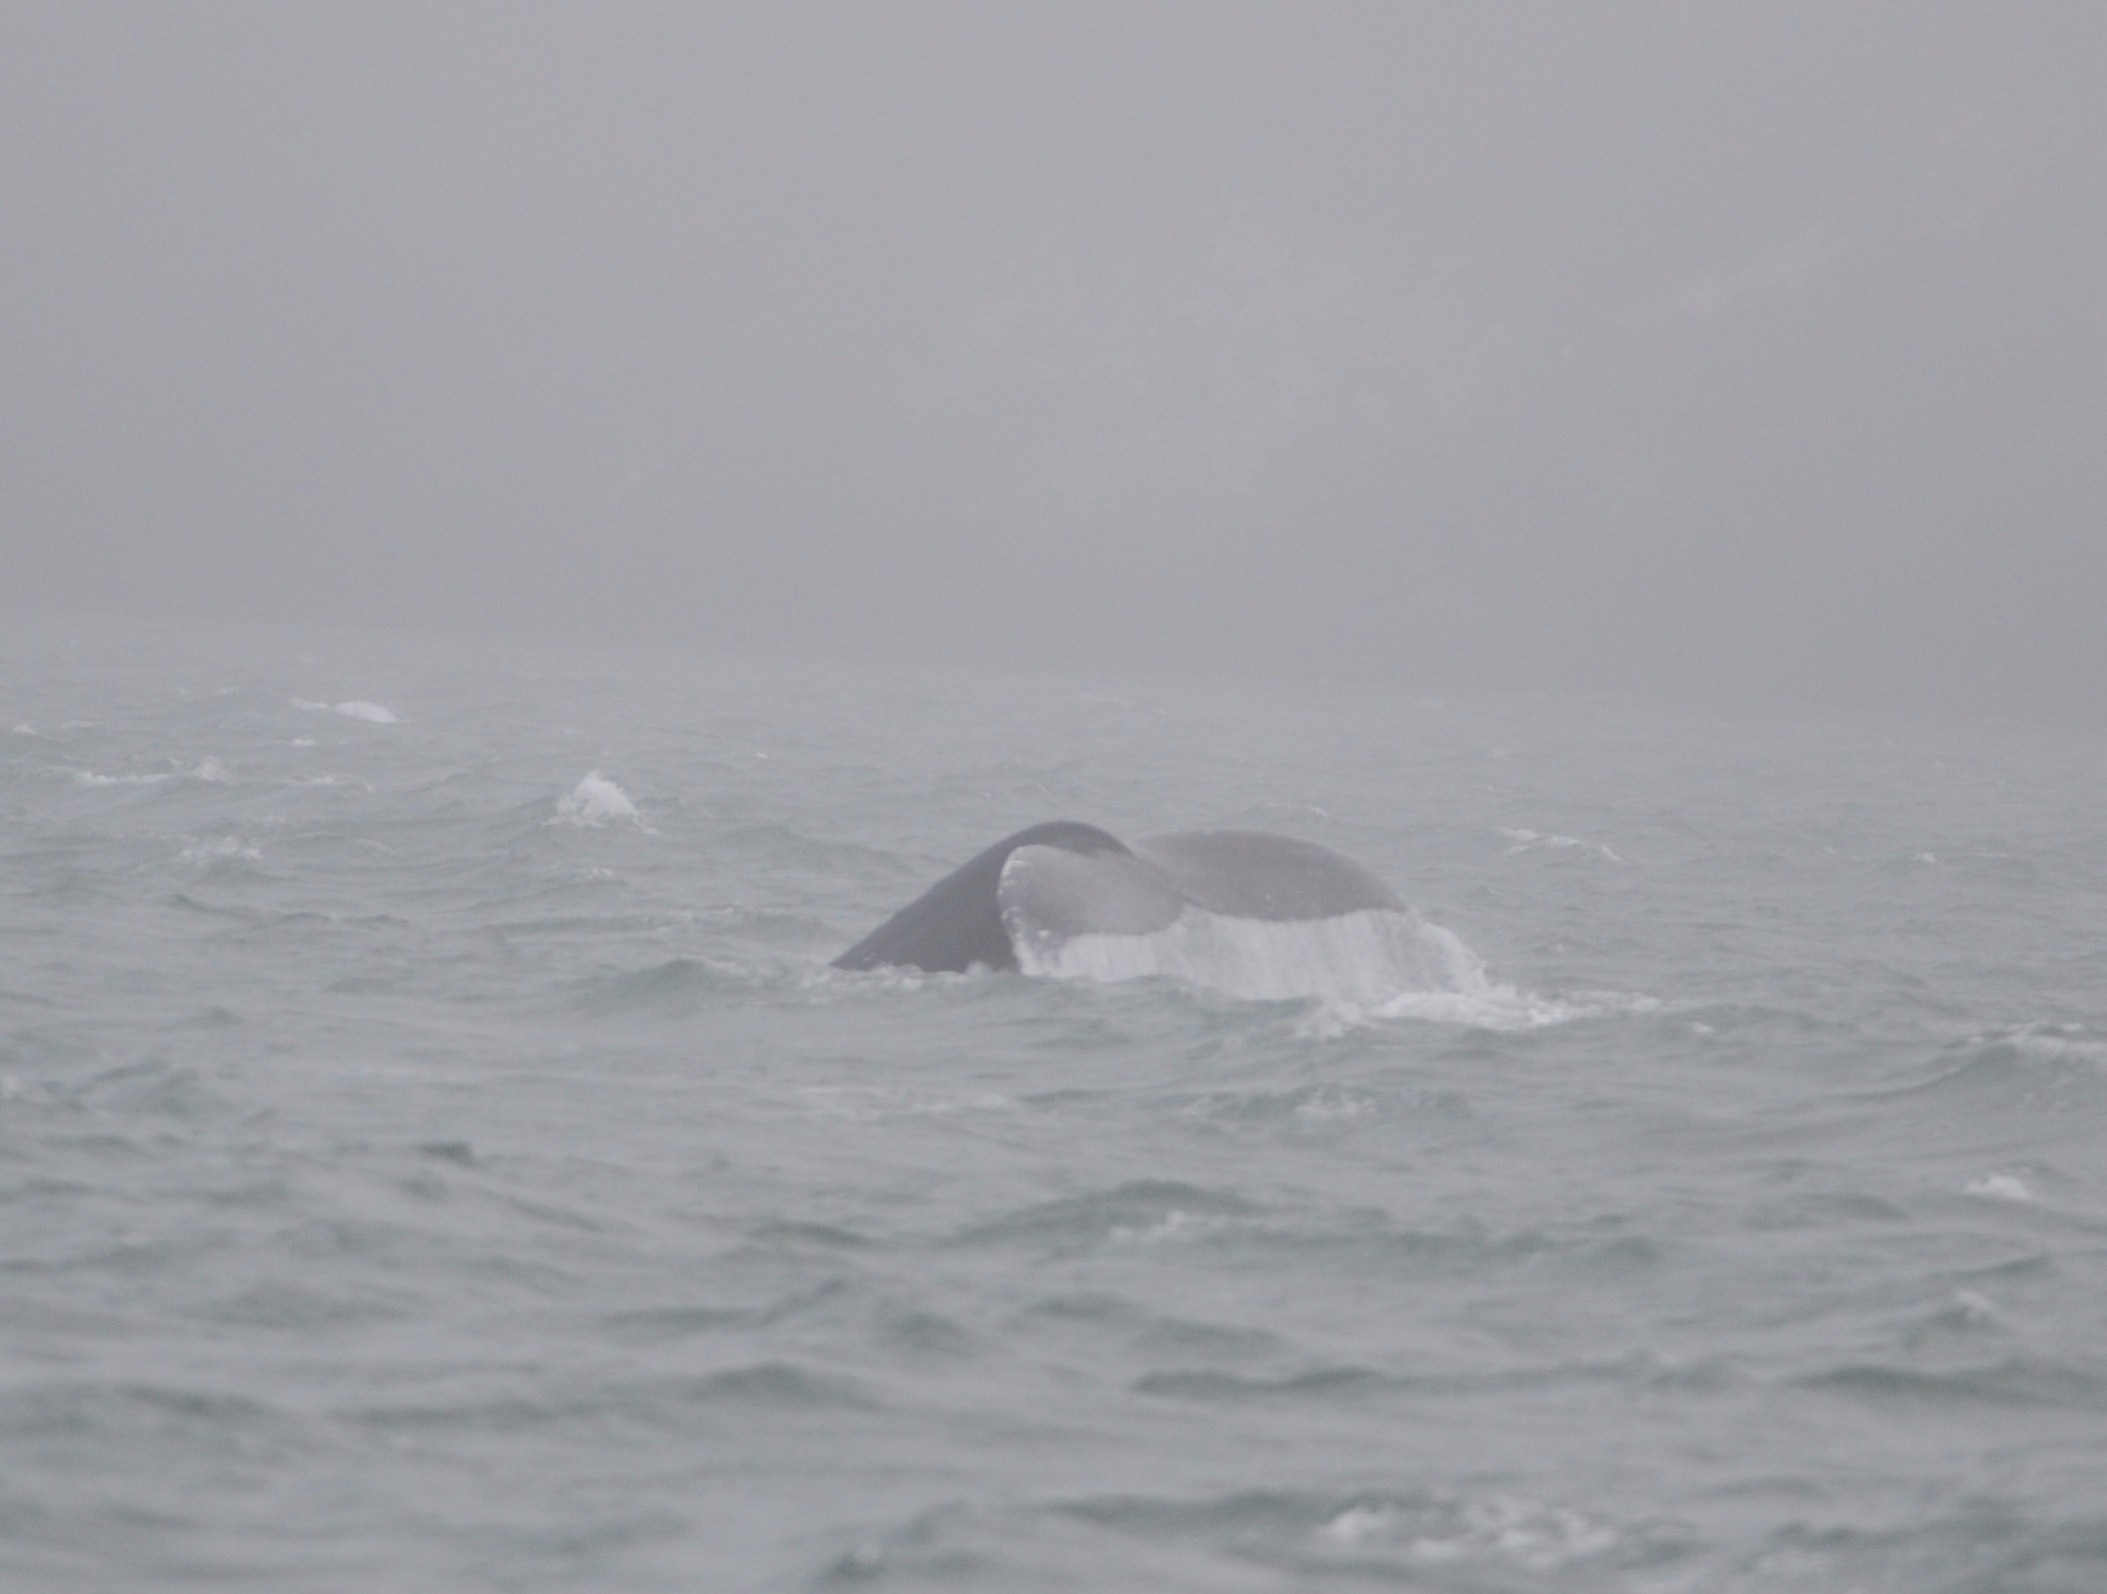 Humpback fluke in the fog.